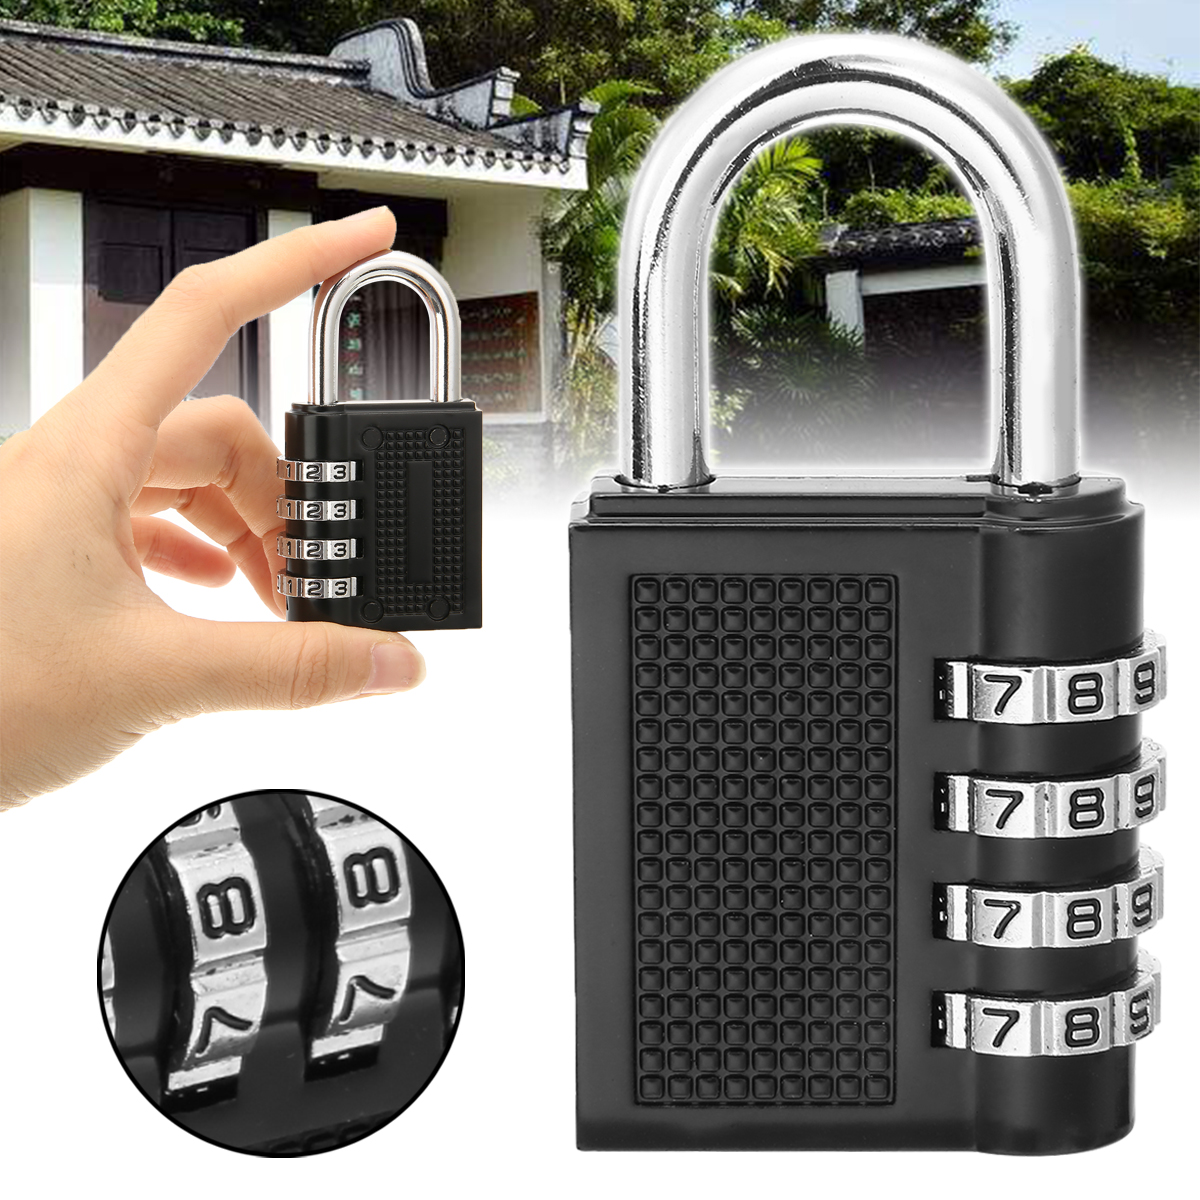 80*43*14mm Heavy Duty 4 Dial Digit Combination Lock Weatherproof Security Padlock Outdoor Gym Safely Code Lock Black